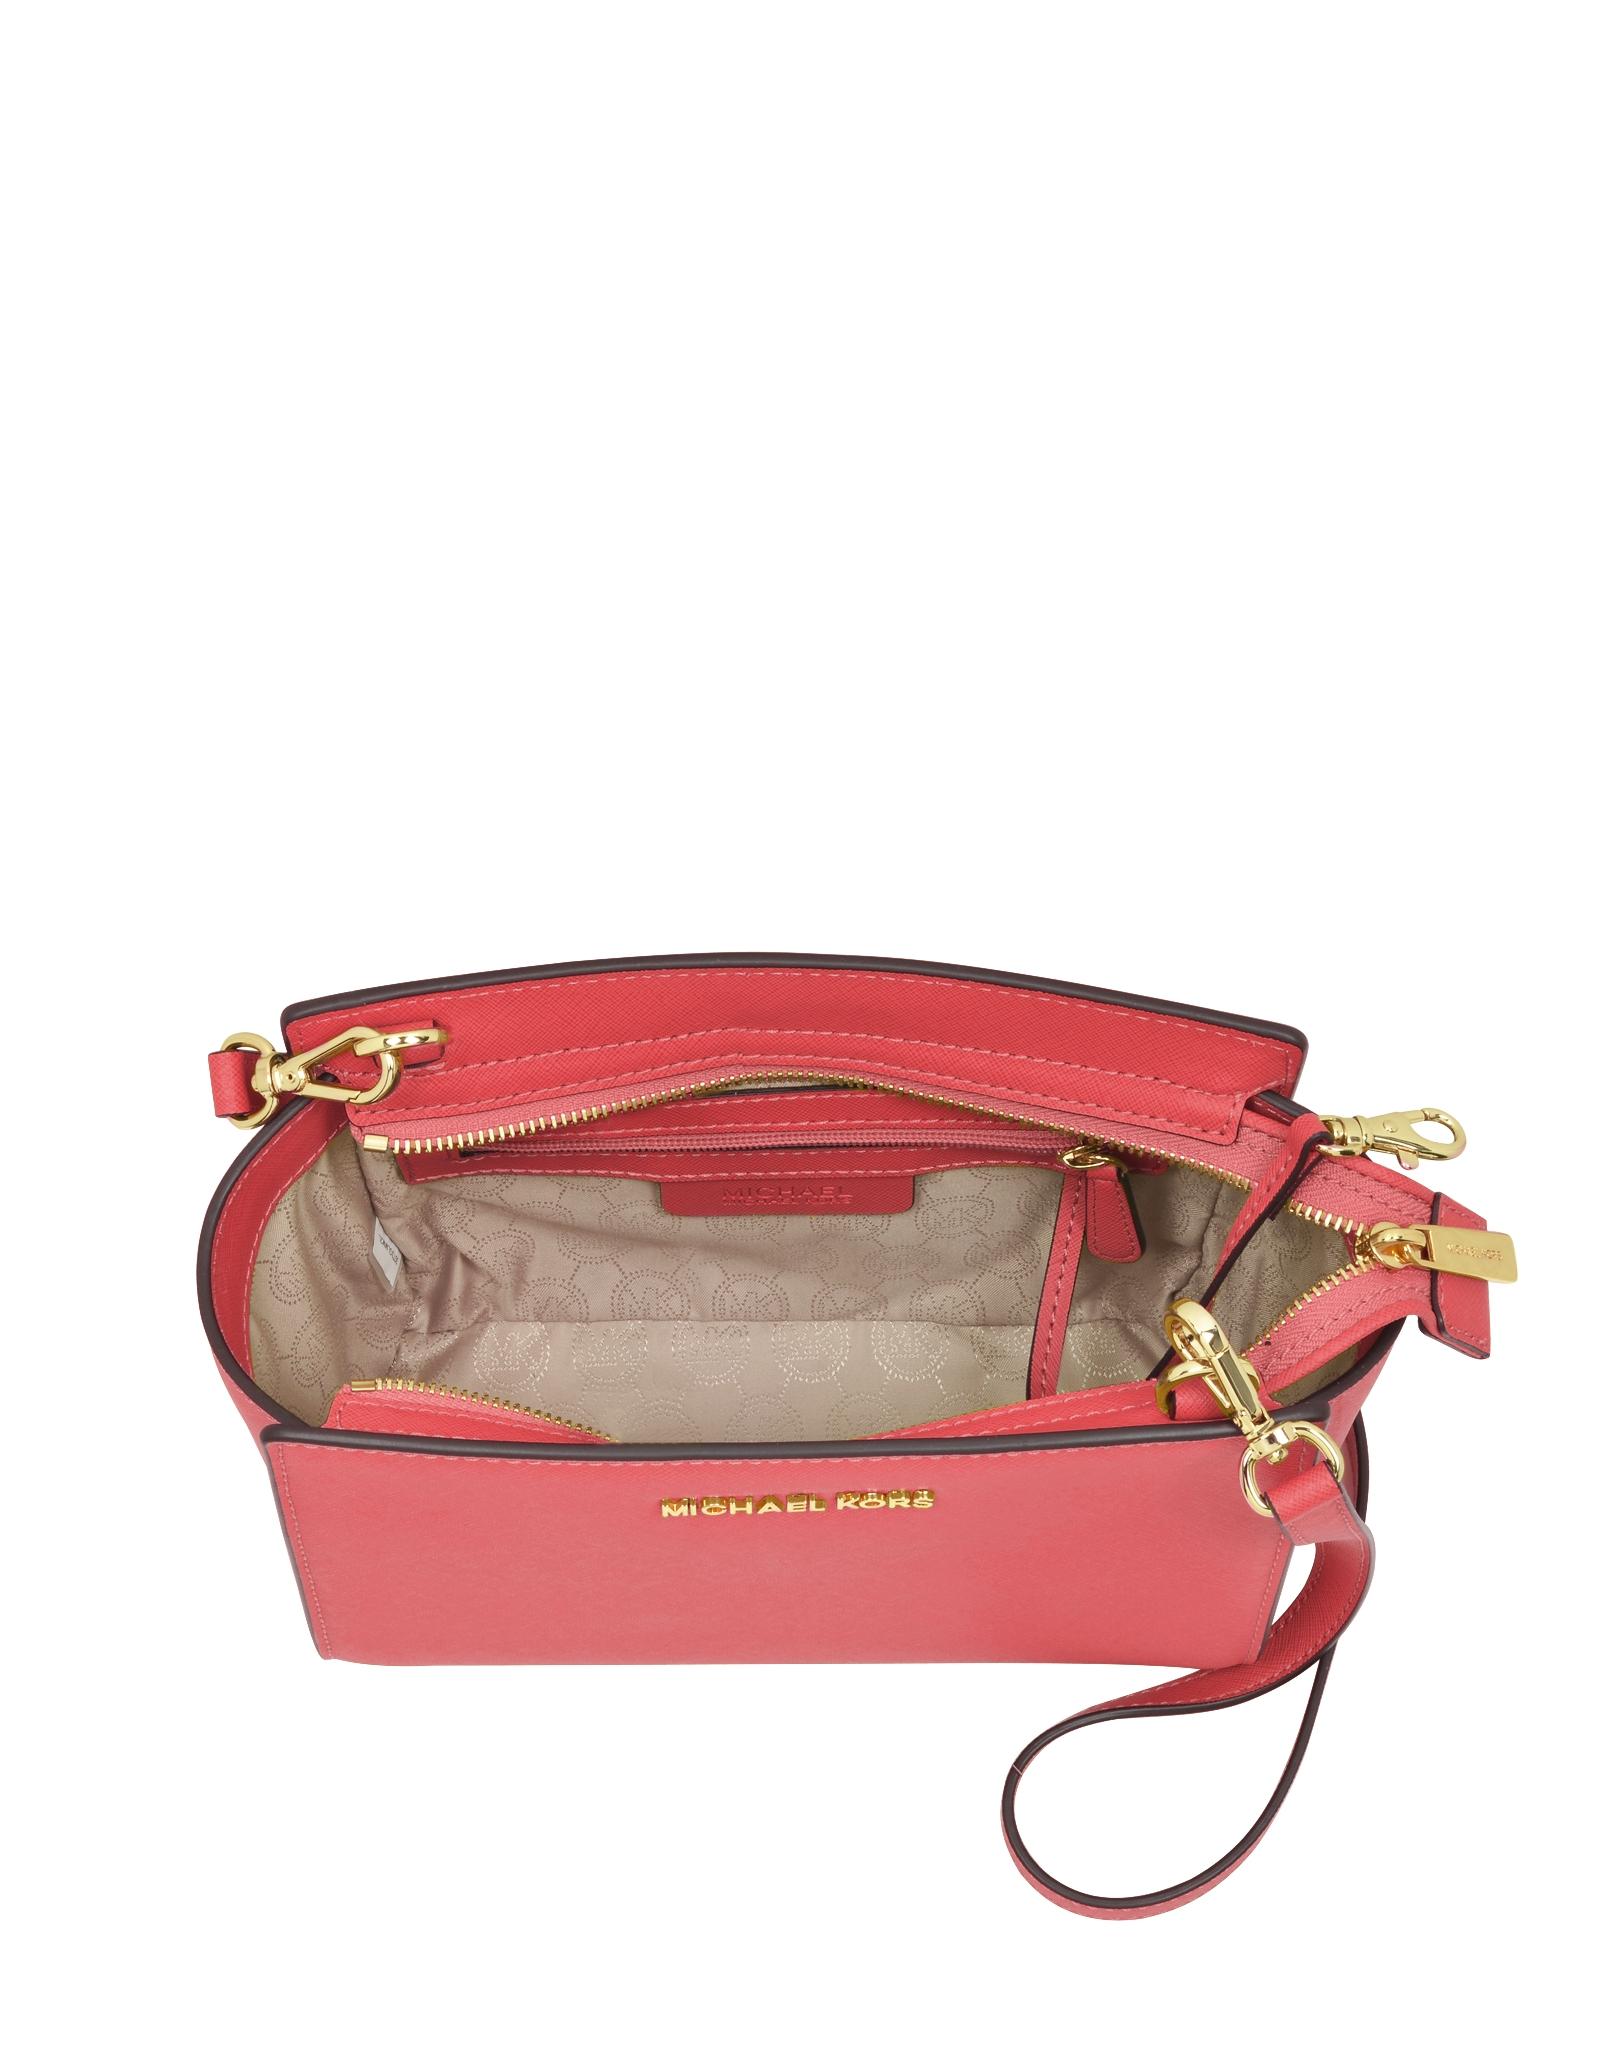 0bd762f237bcf7 Michael Kors Selma Medium Saffiano Leather Messenger Bag in Pink - Lyst